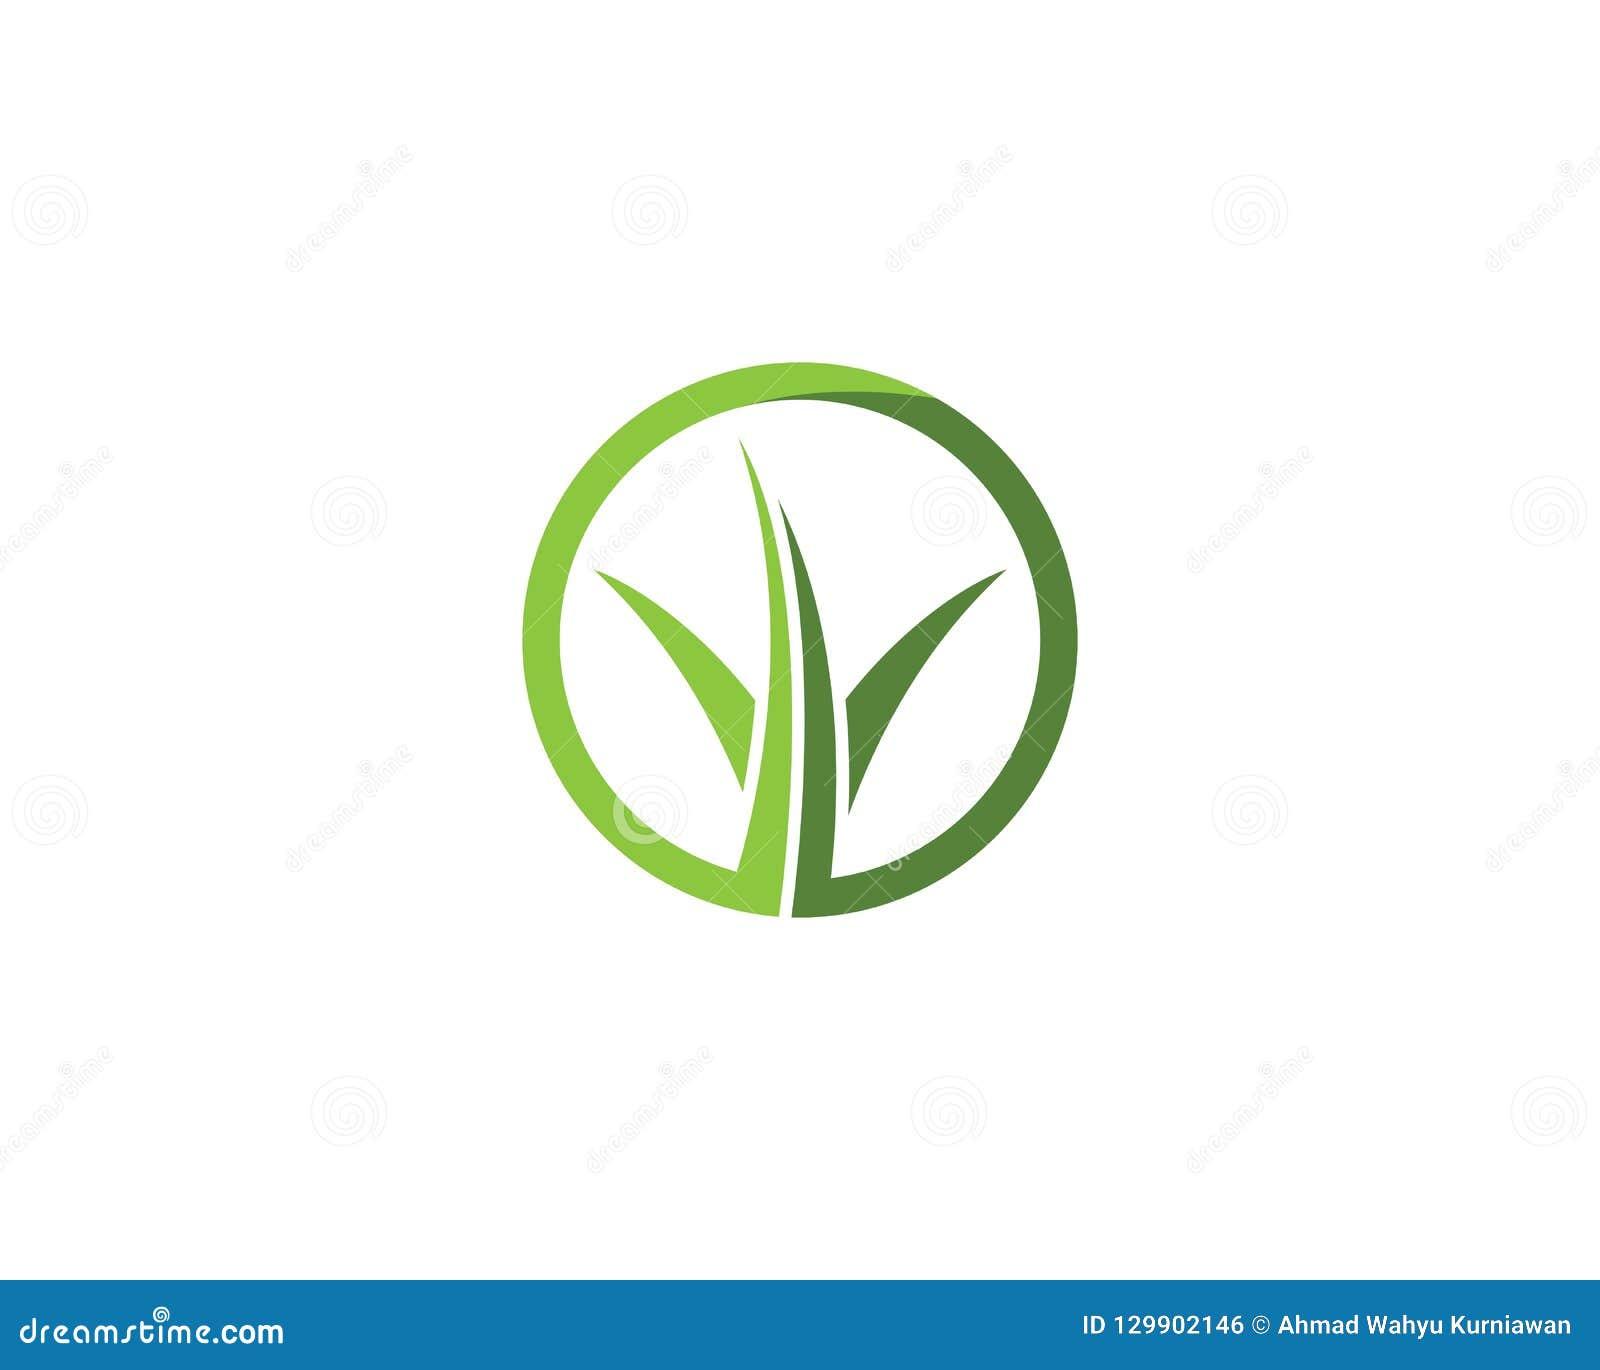 grass logo vector stock vector illustration of design 129902146 https www dreamstime com grass logo vector grass logo vector template image129902146